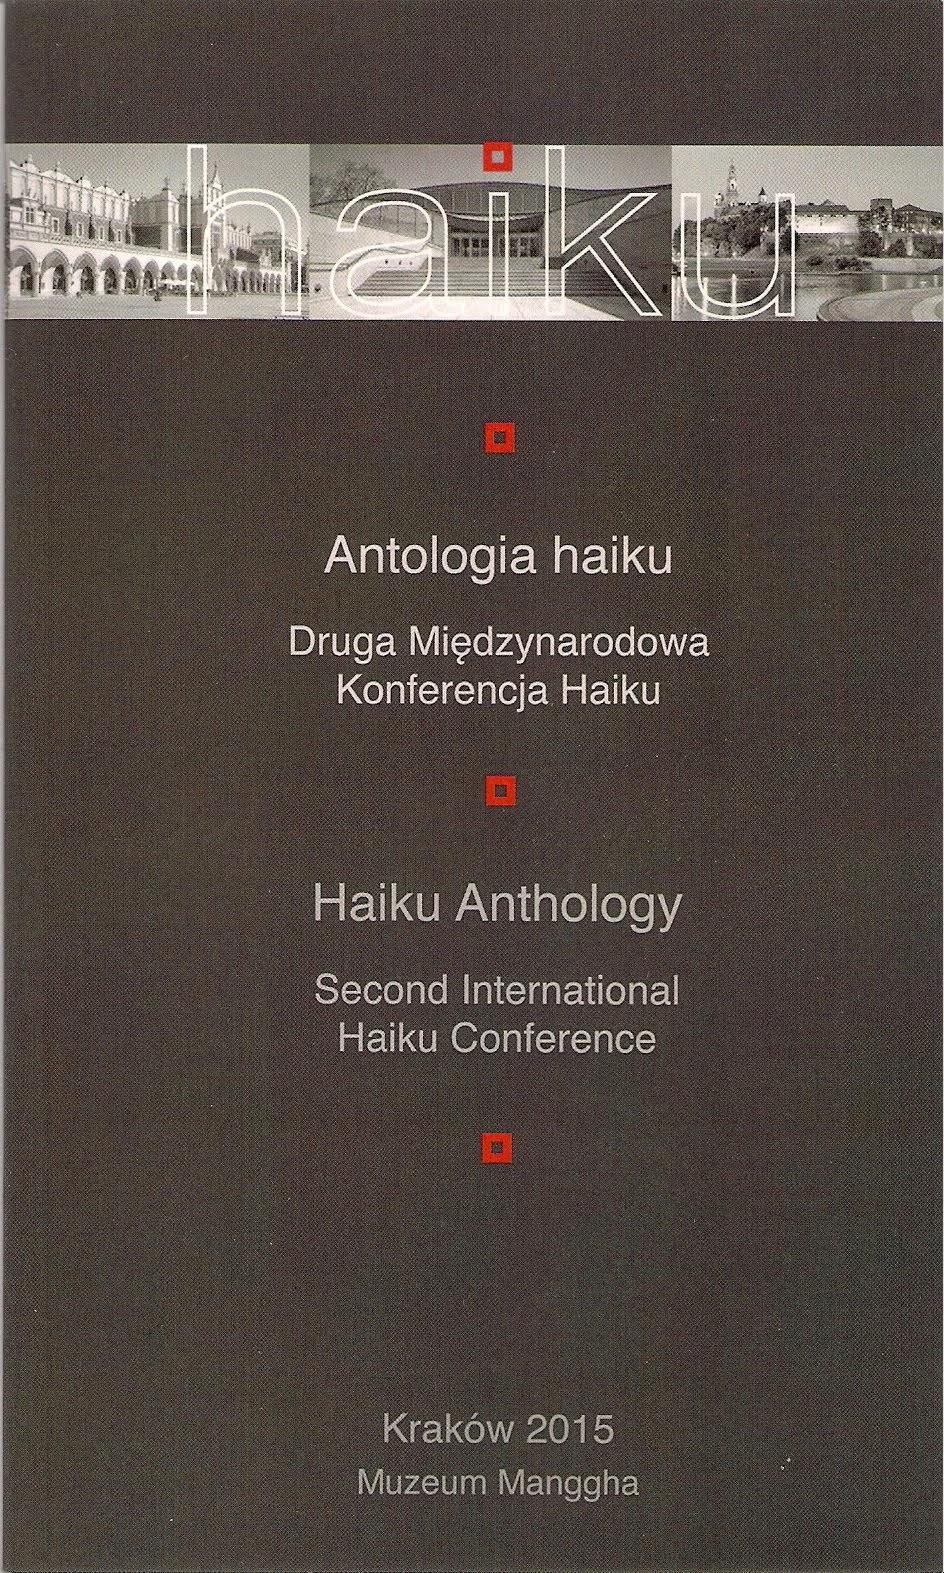 Antologia haiku 2nd IHC Cracow